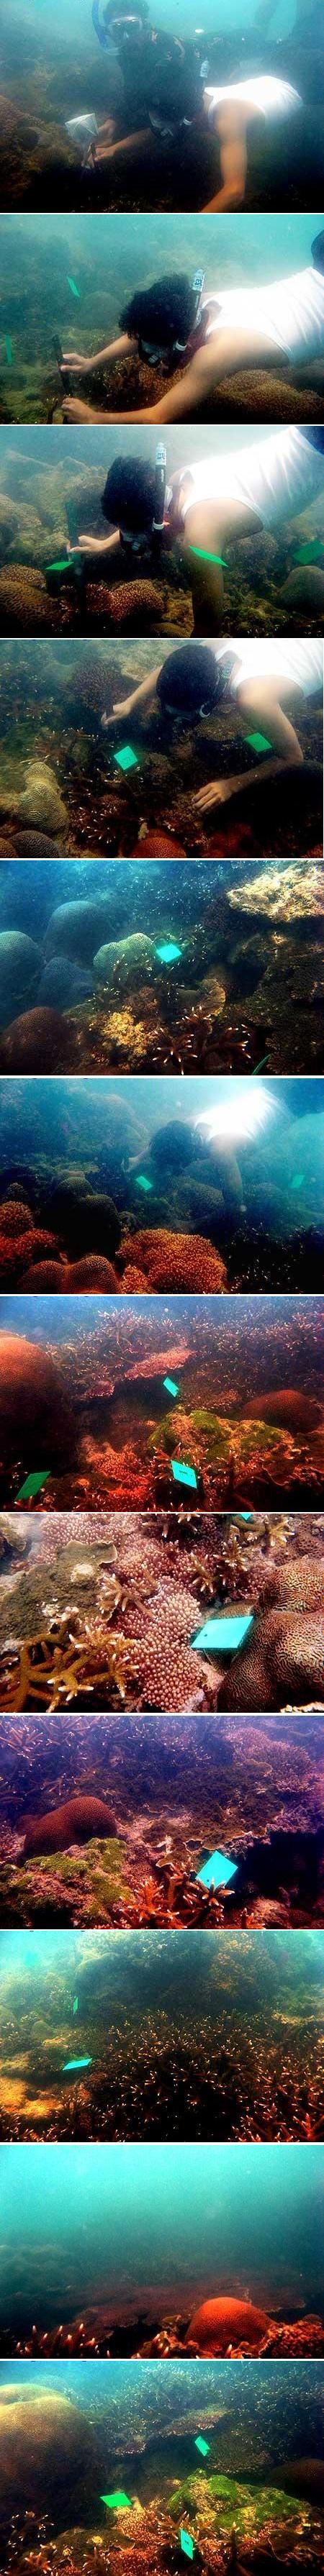 Karang A formosa yang telah dipasang tanda nomor, selanjutnya akan dihitung kembali pada tahun berikutnya. Pengukuran tinggi karang di Batu Putih, Sungailiat, Bangka (Okt 2008)